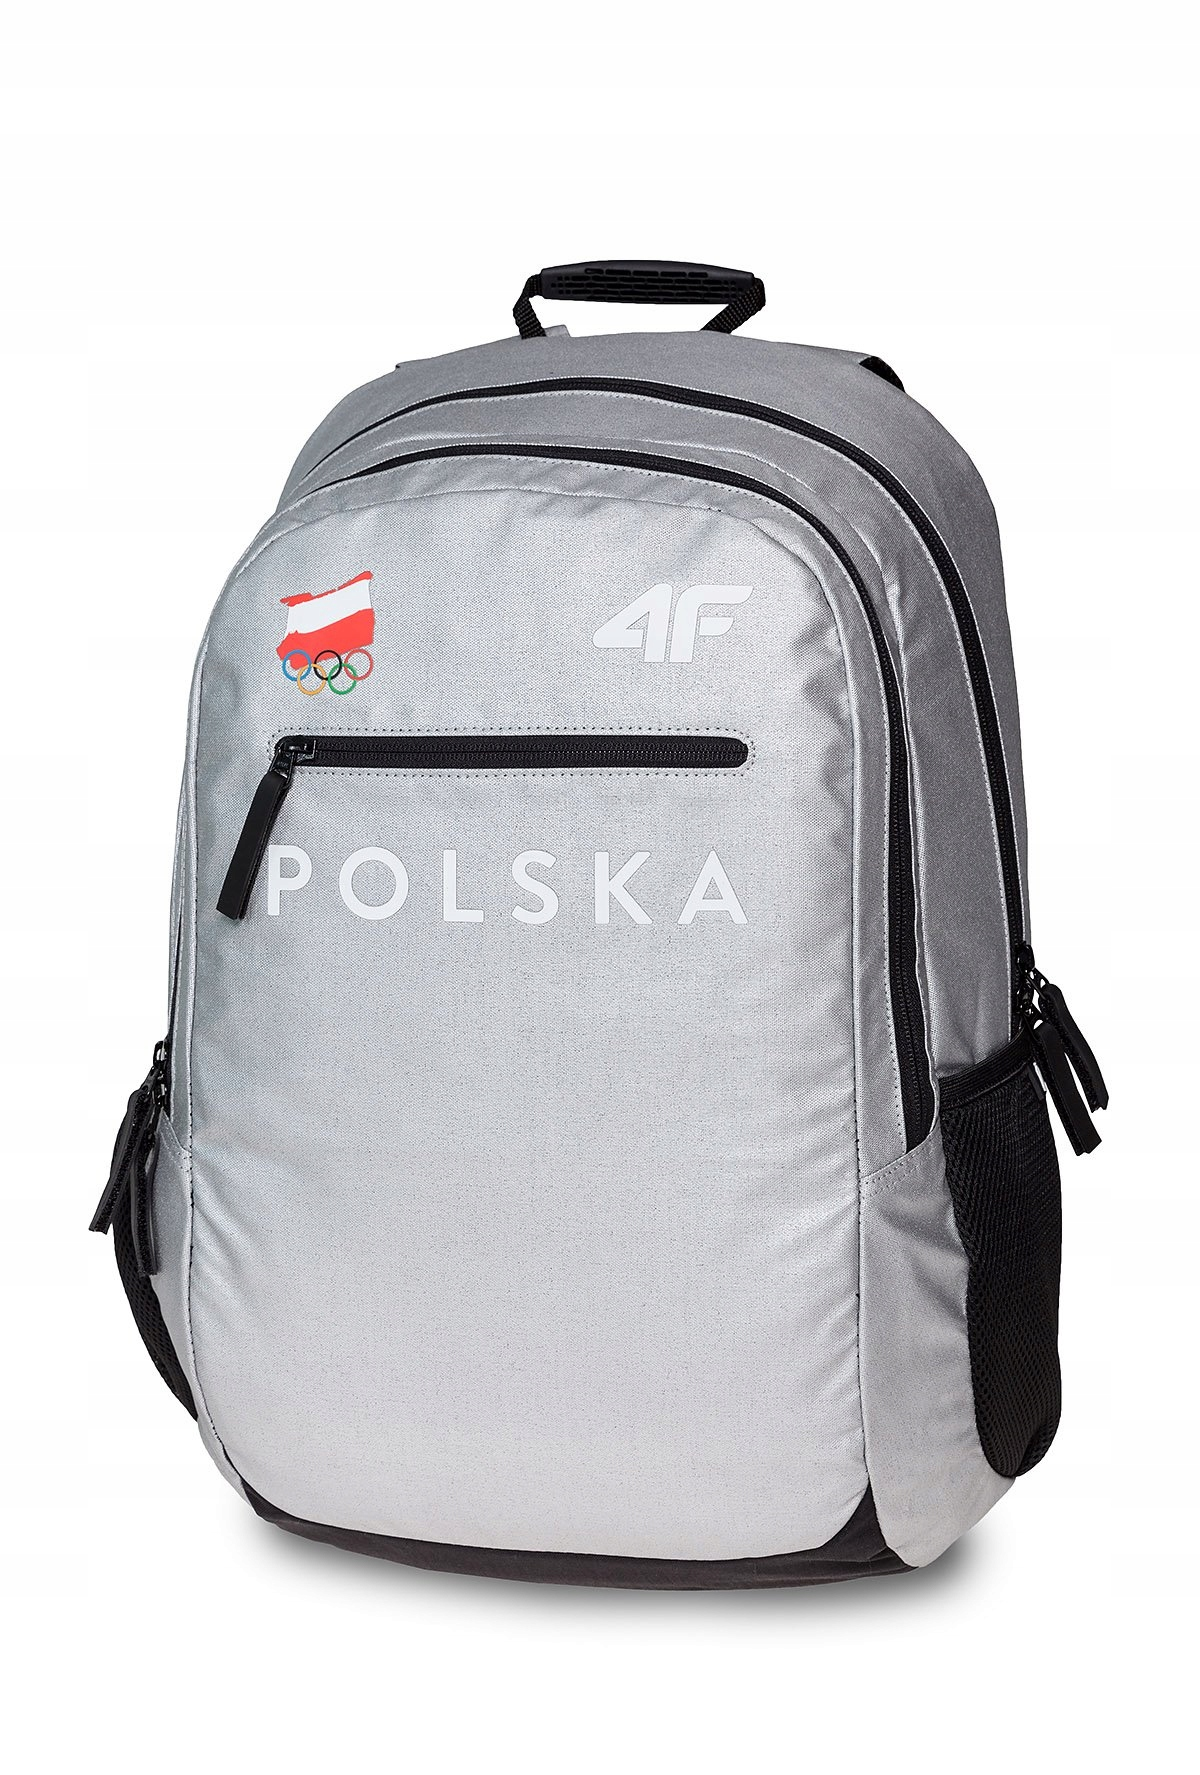 a0bfaed0c1915 Plecak 4F POLSKA - 7500583403 - oficjalne archiwum allegro